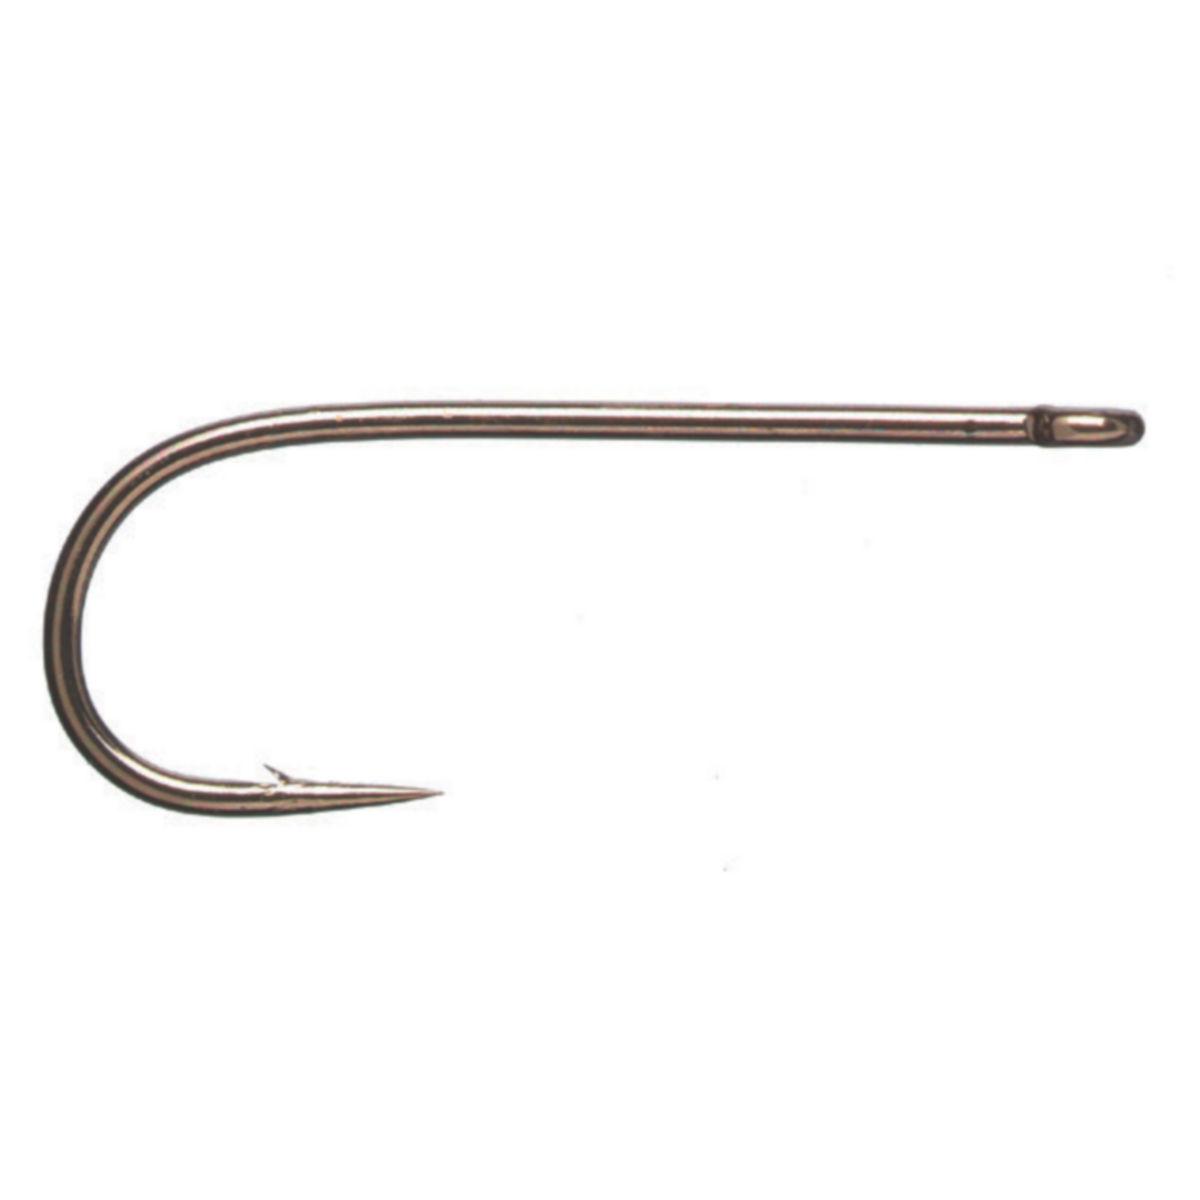 Big Eye Hook in Straight-Eye Style - Box of 25 - image number 0